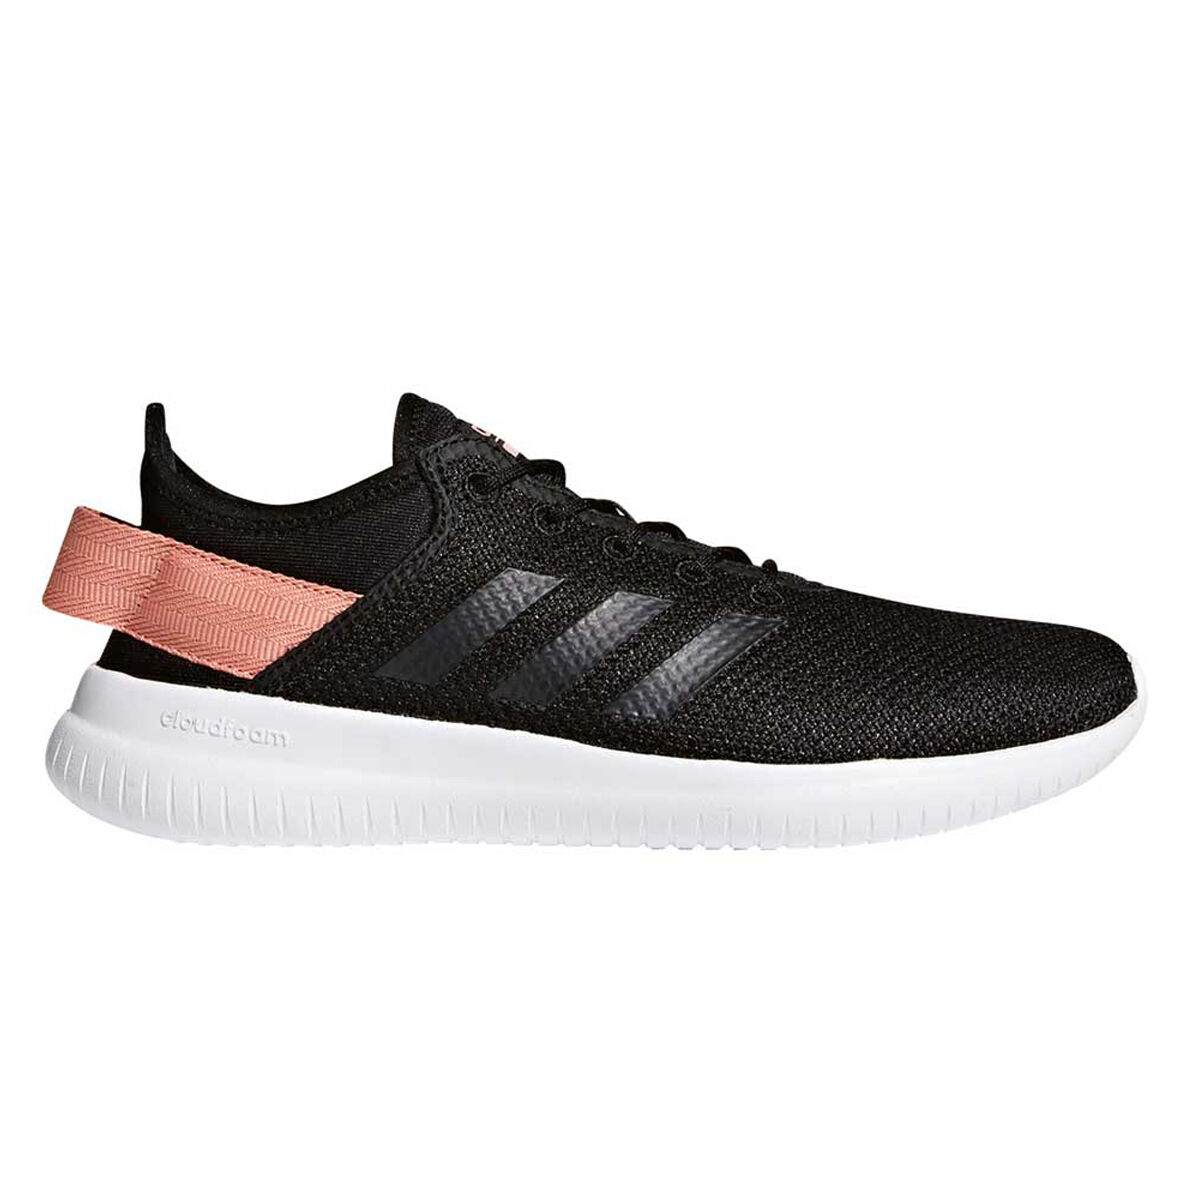 adidas Cloudfoam QT Flex Womens Casual Shoes